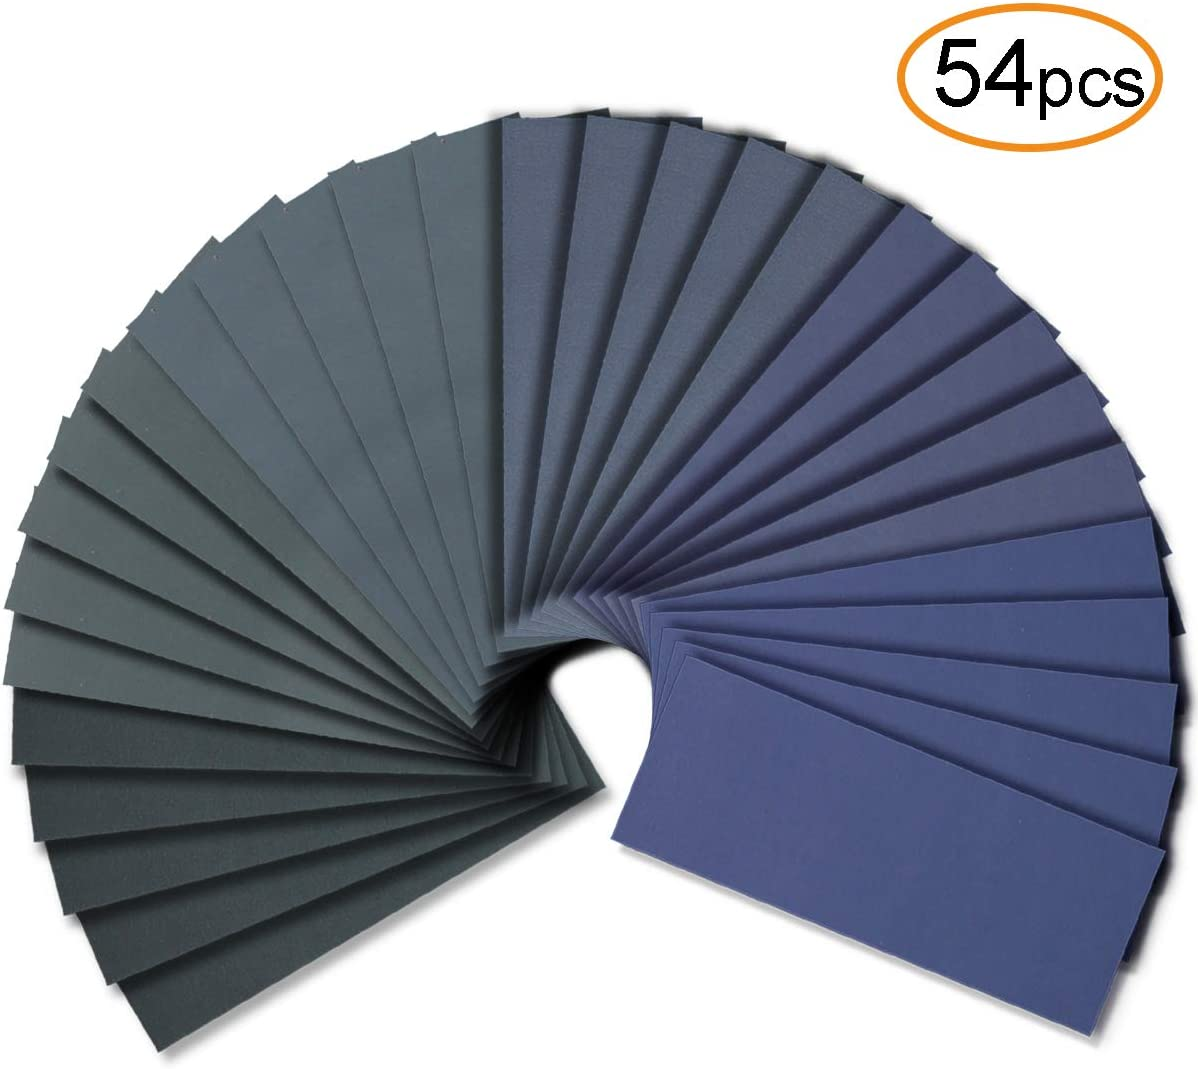 54pcs Wet Dry Sandpaper Assorted 3000/2500/2000/1500/1200/1000 Grit for Automotive Sanding: Industrial & Scientific